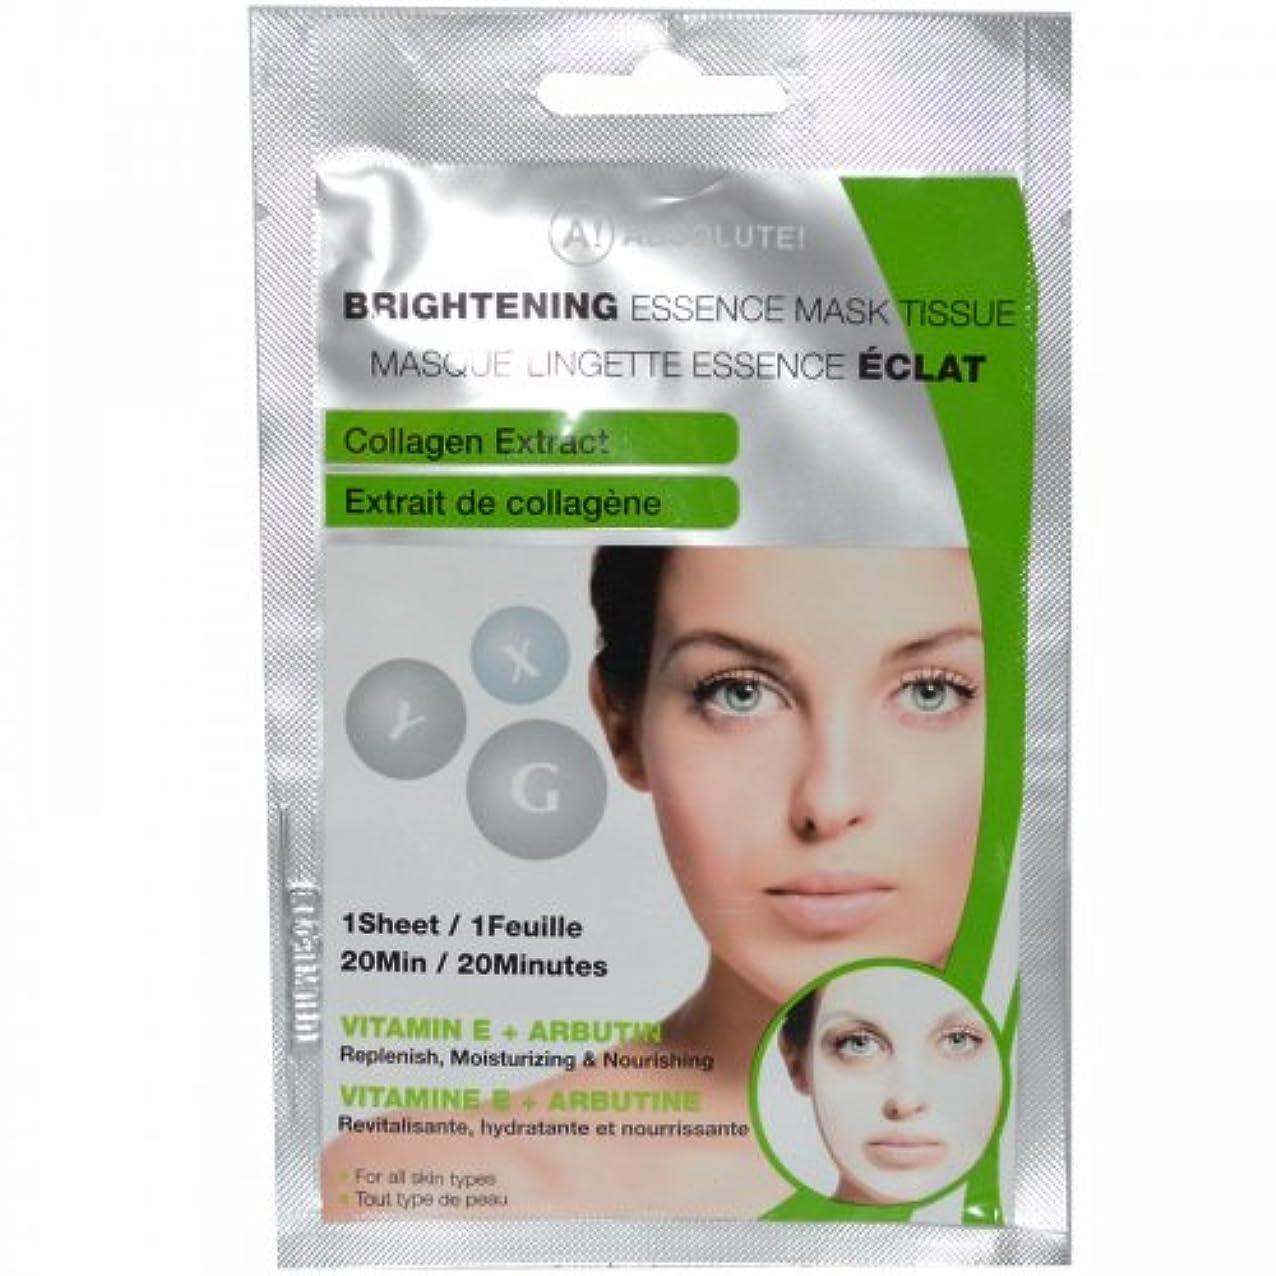 政権異邦人願望海外直送品Nicka K Cosmetics Brightening Essence Face Mask, Collagen Extract 1 ct